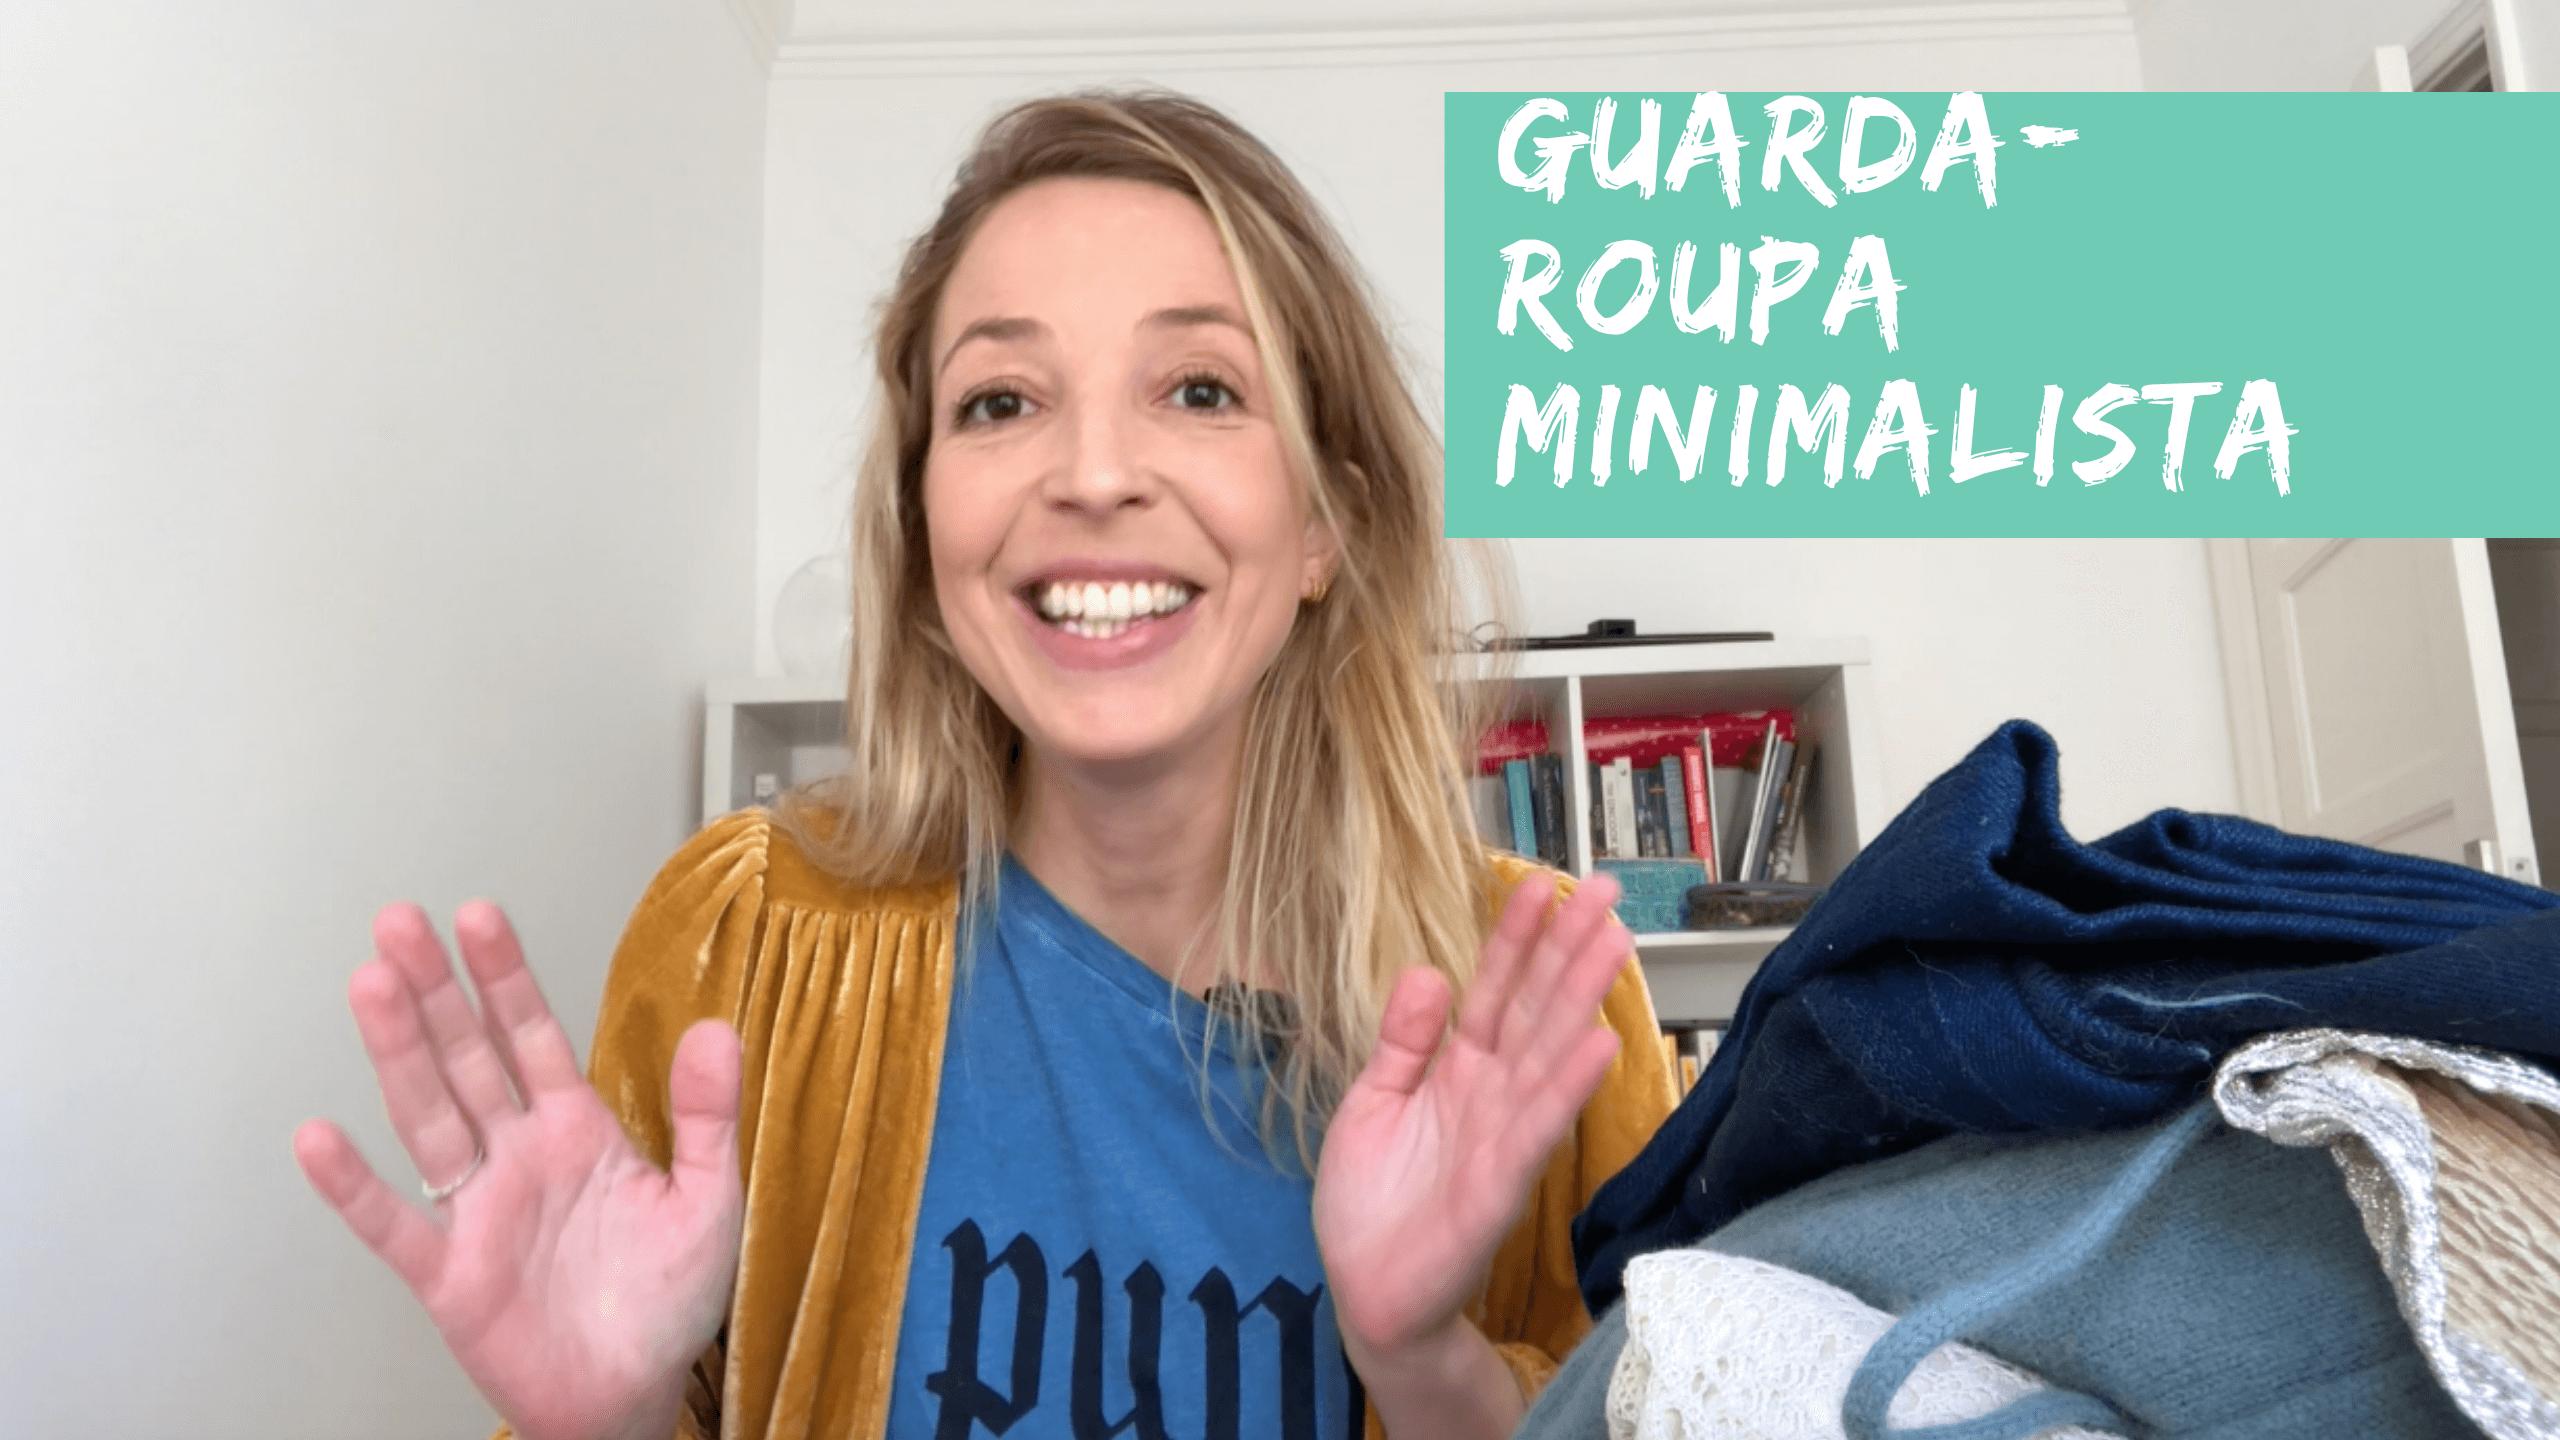 Minimalismo: como ter um guarda-roupa minimalista em 3 passos